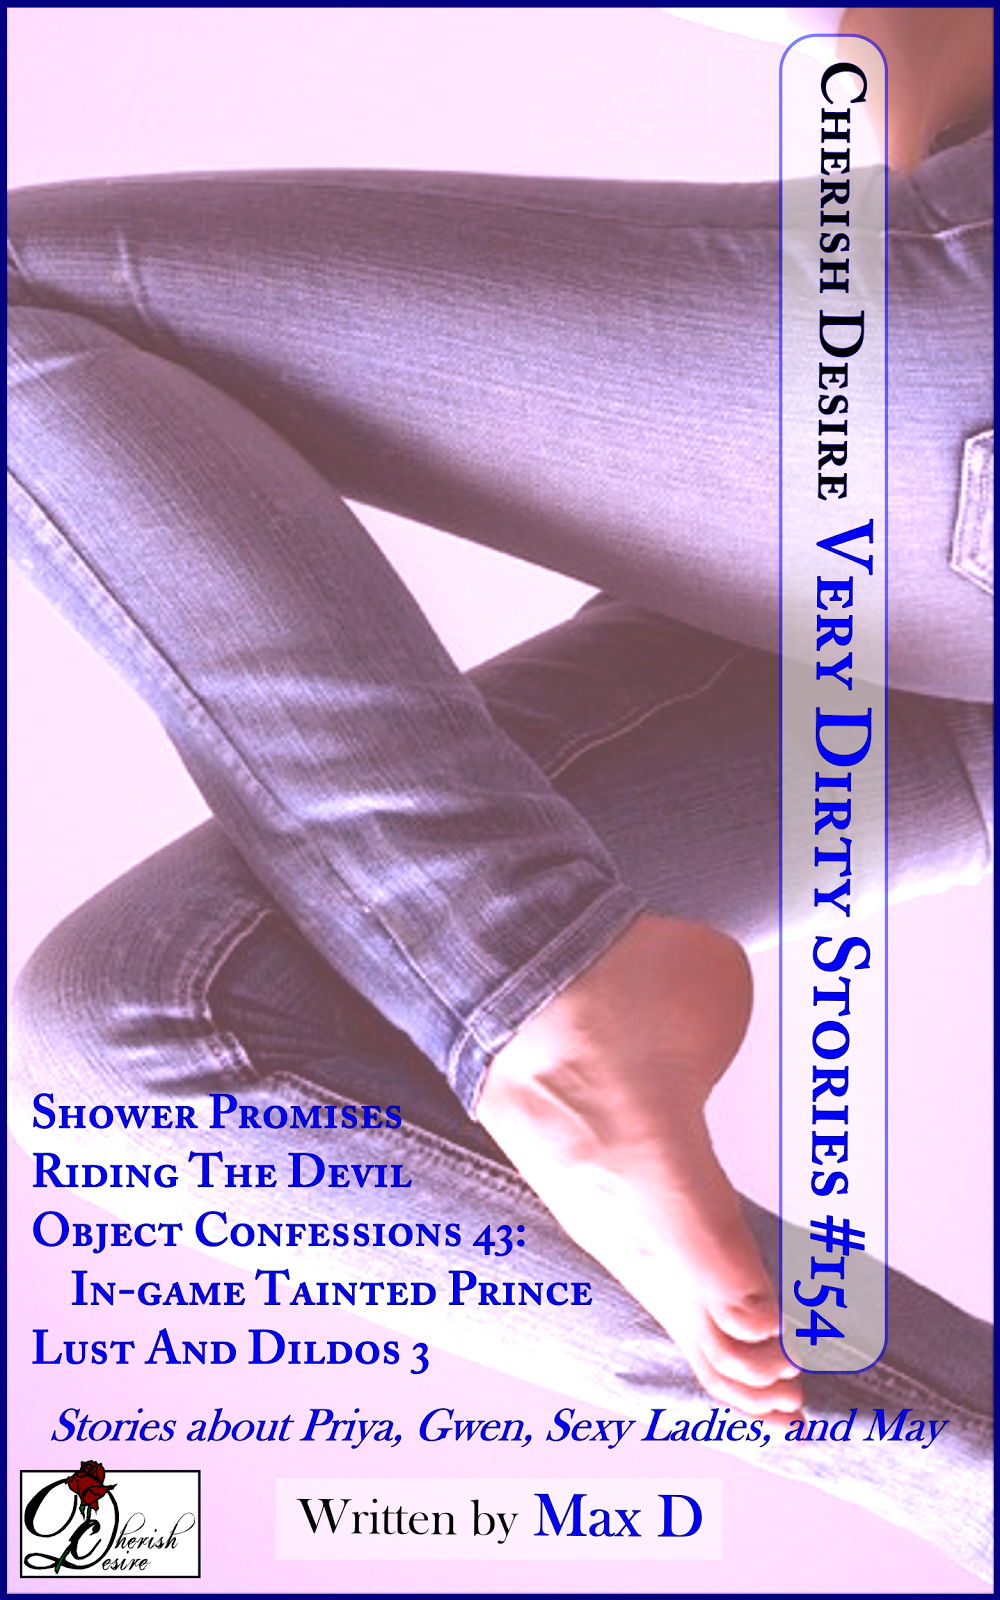 Cherish Desire: Very Dirty Stories #154, Max D, erotica